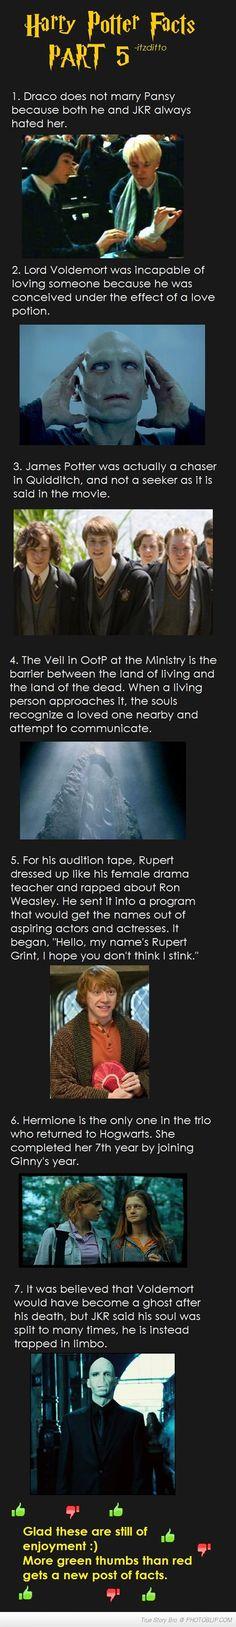 Harry Potter Facts Part 5